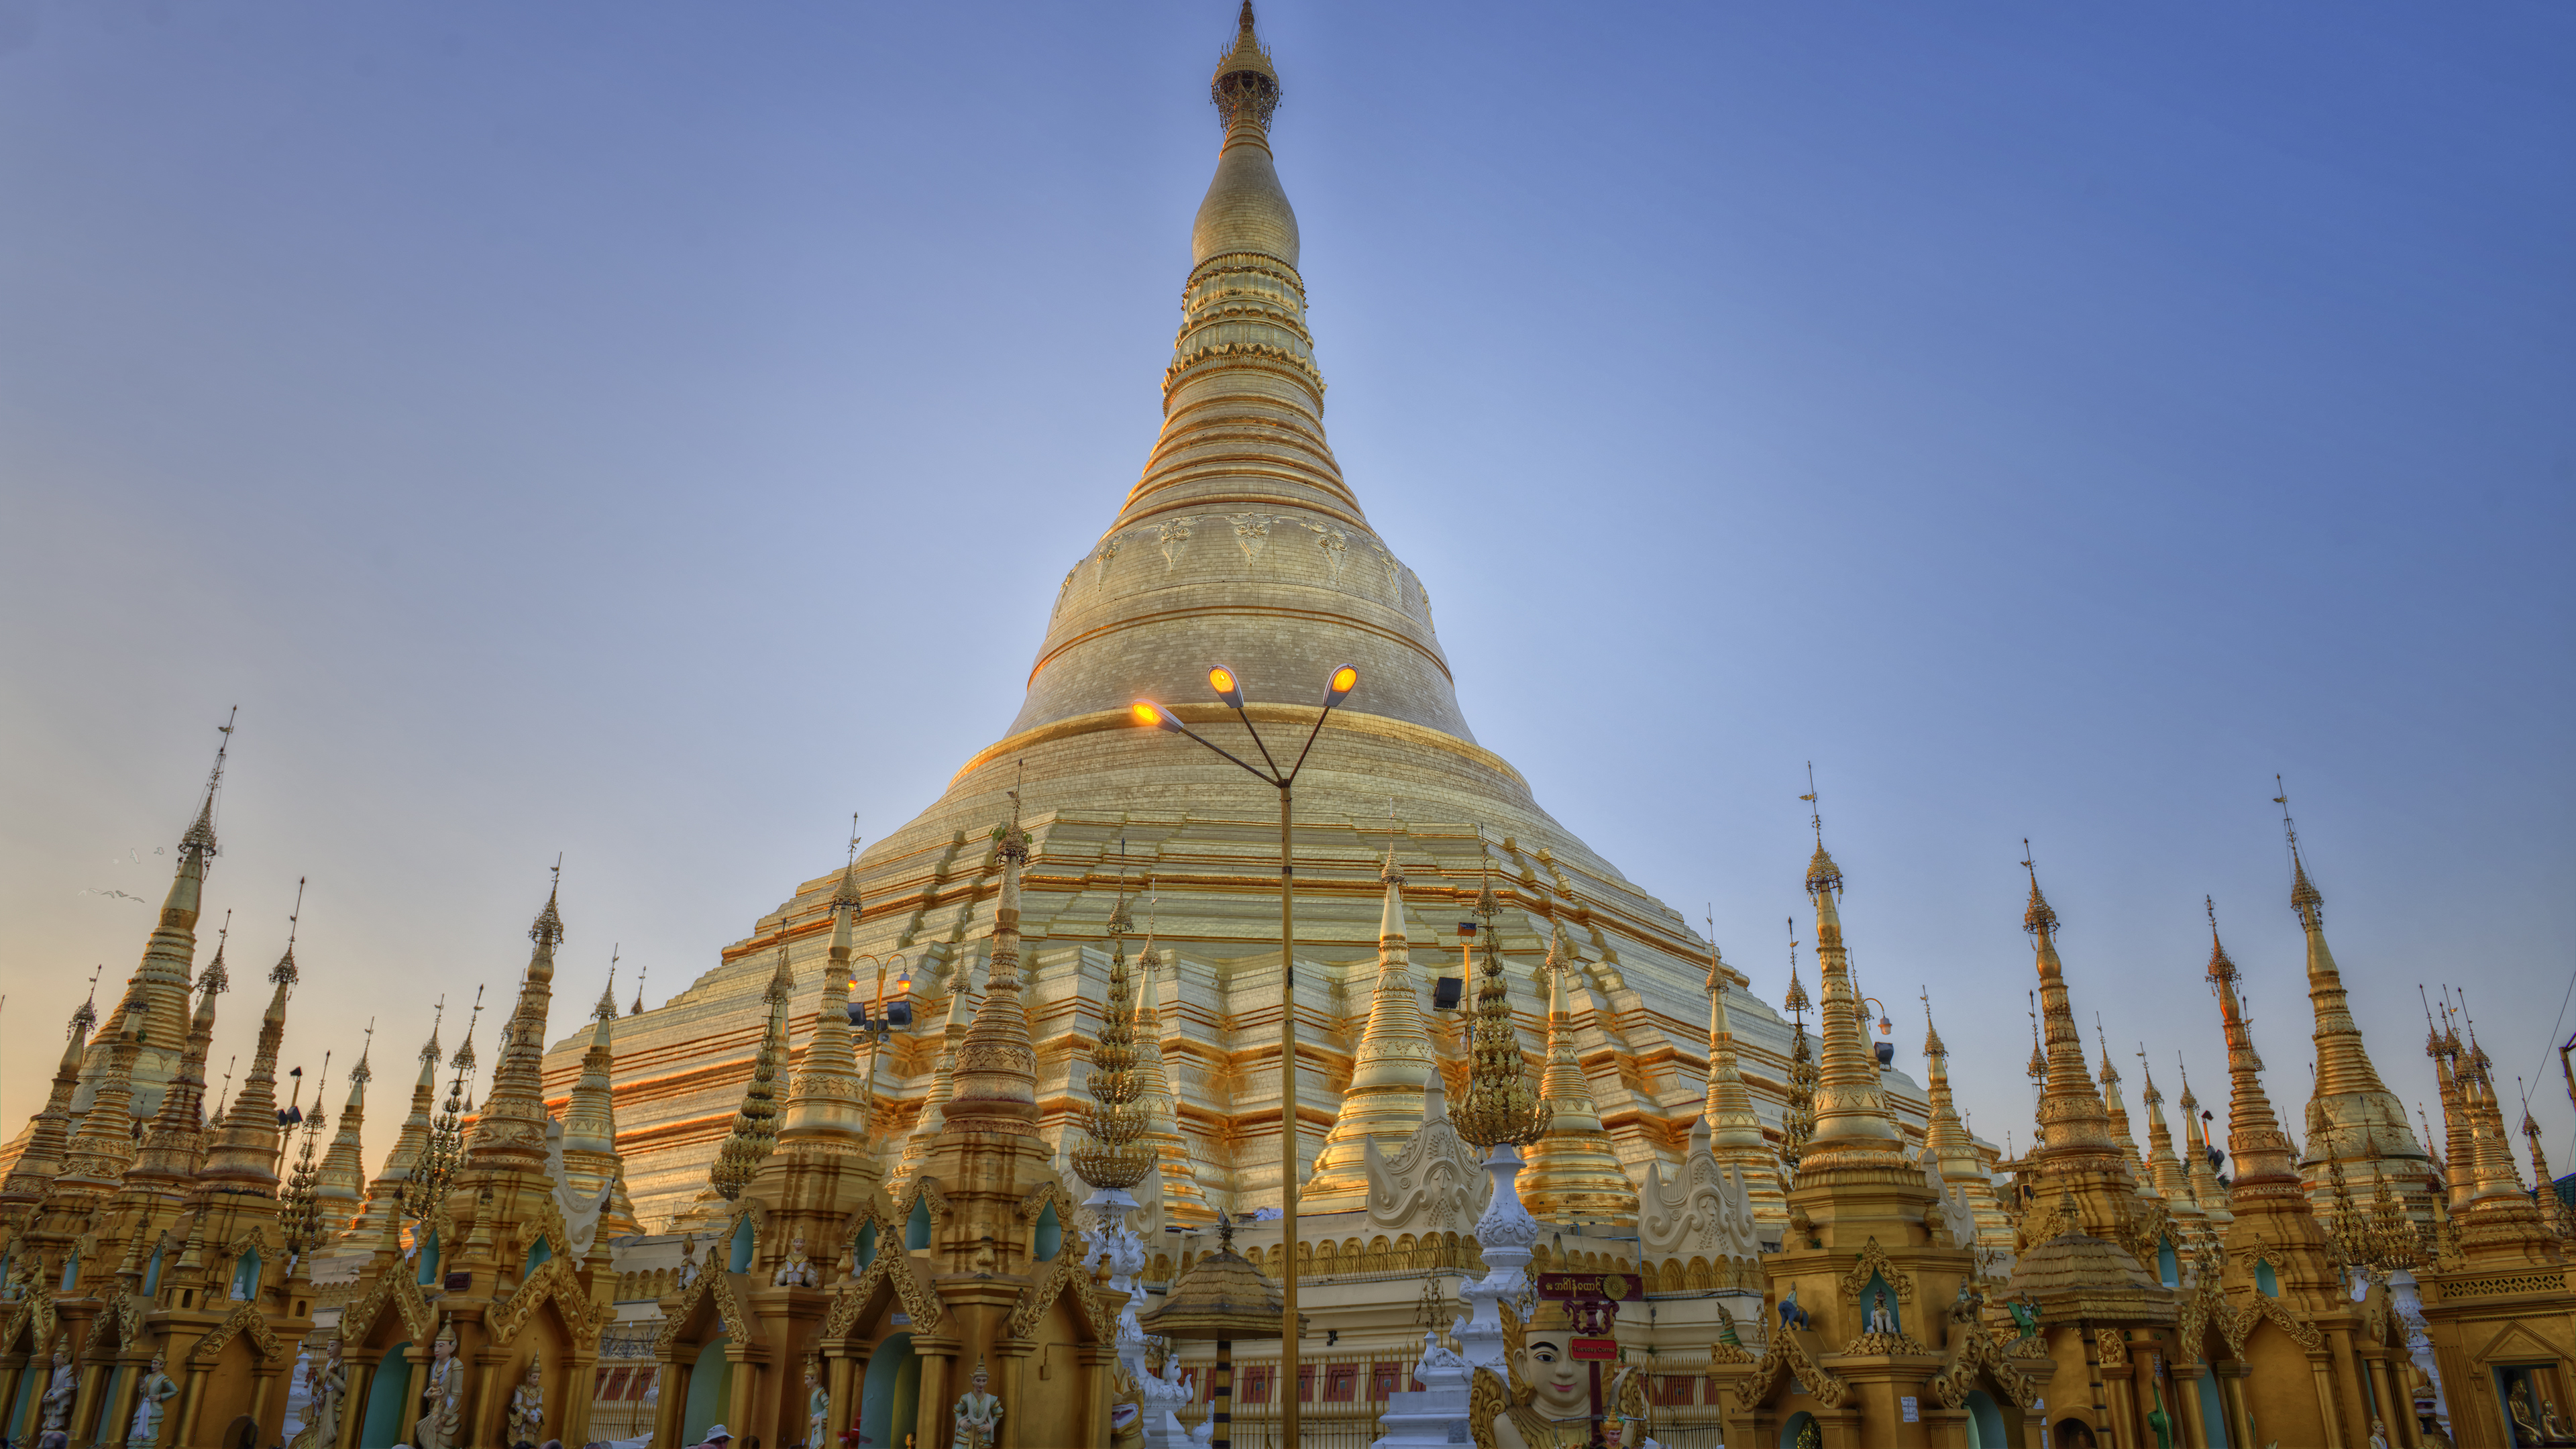 Pagodas in Yangon